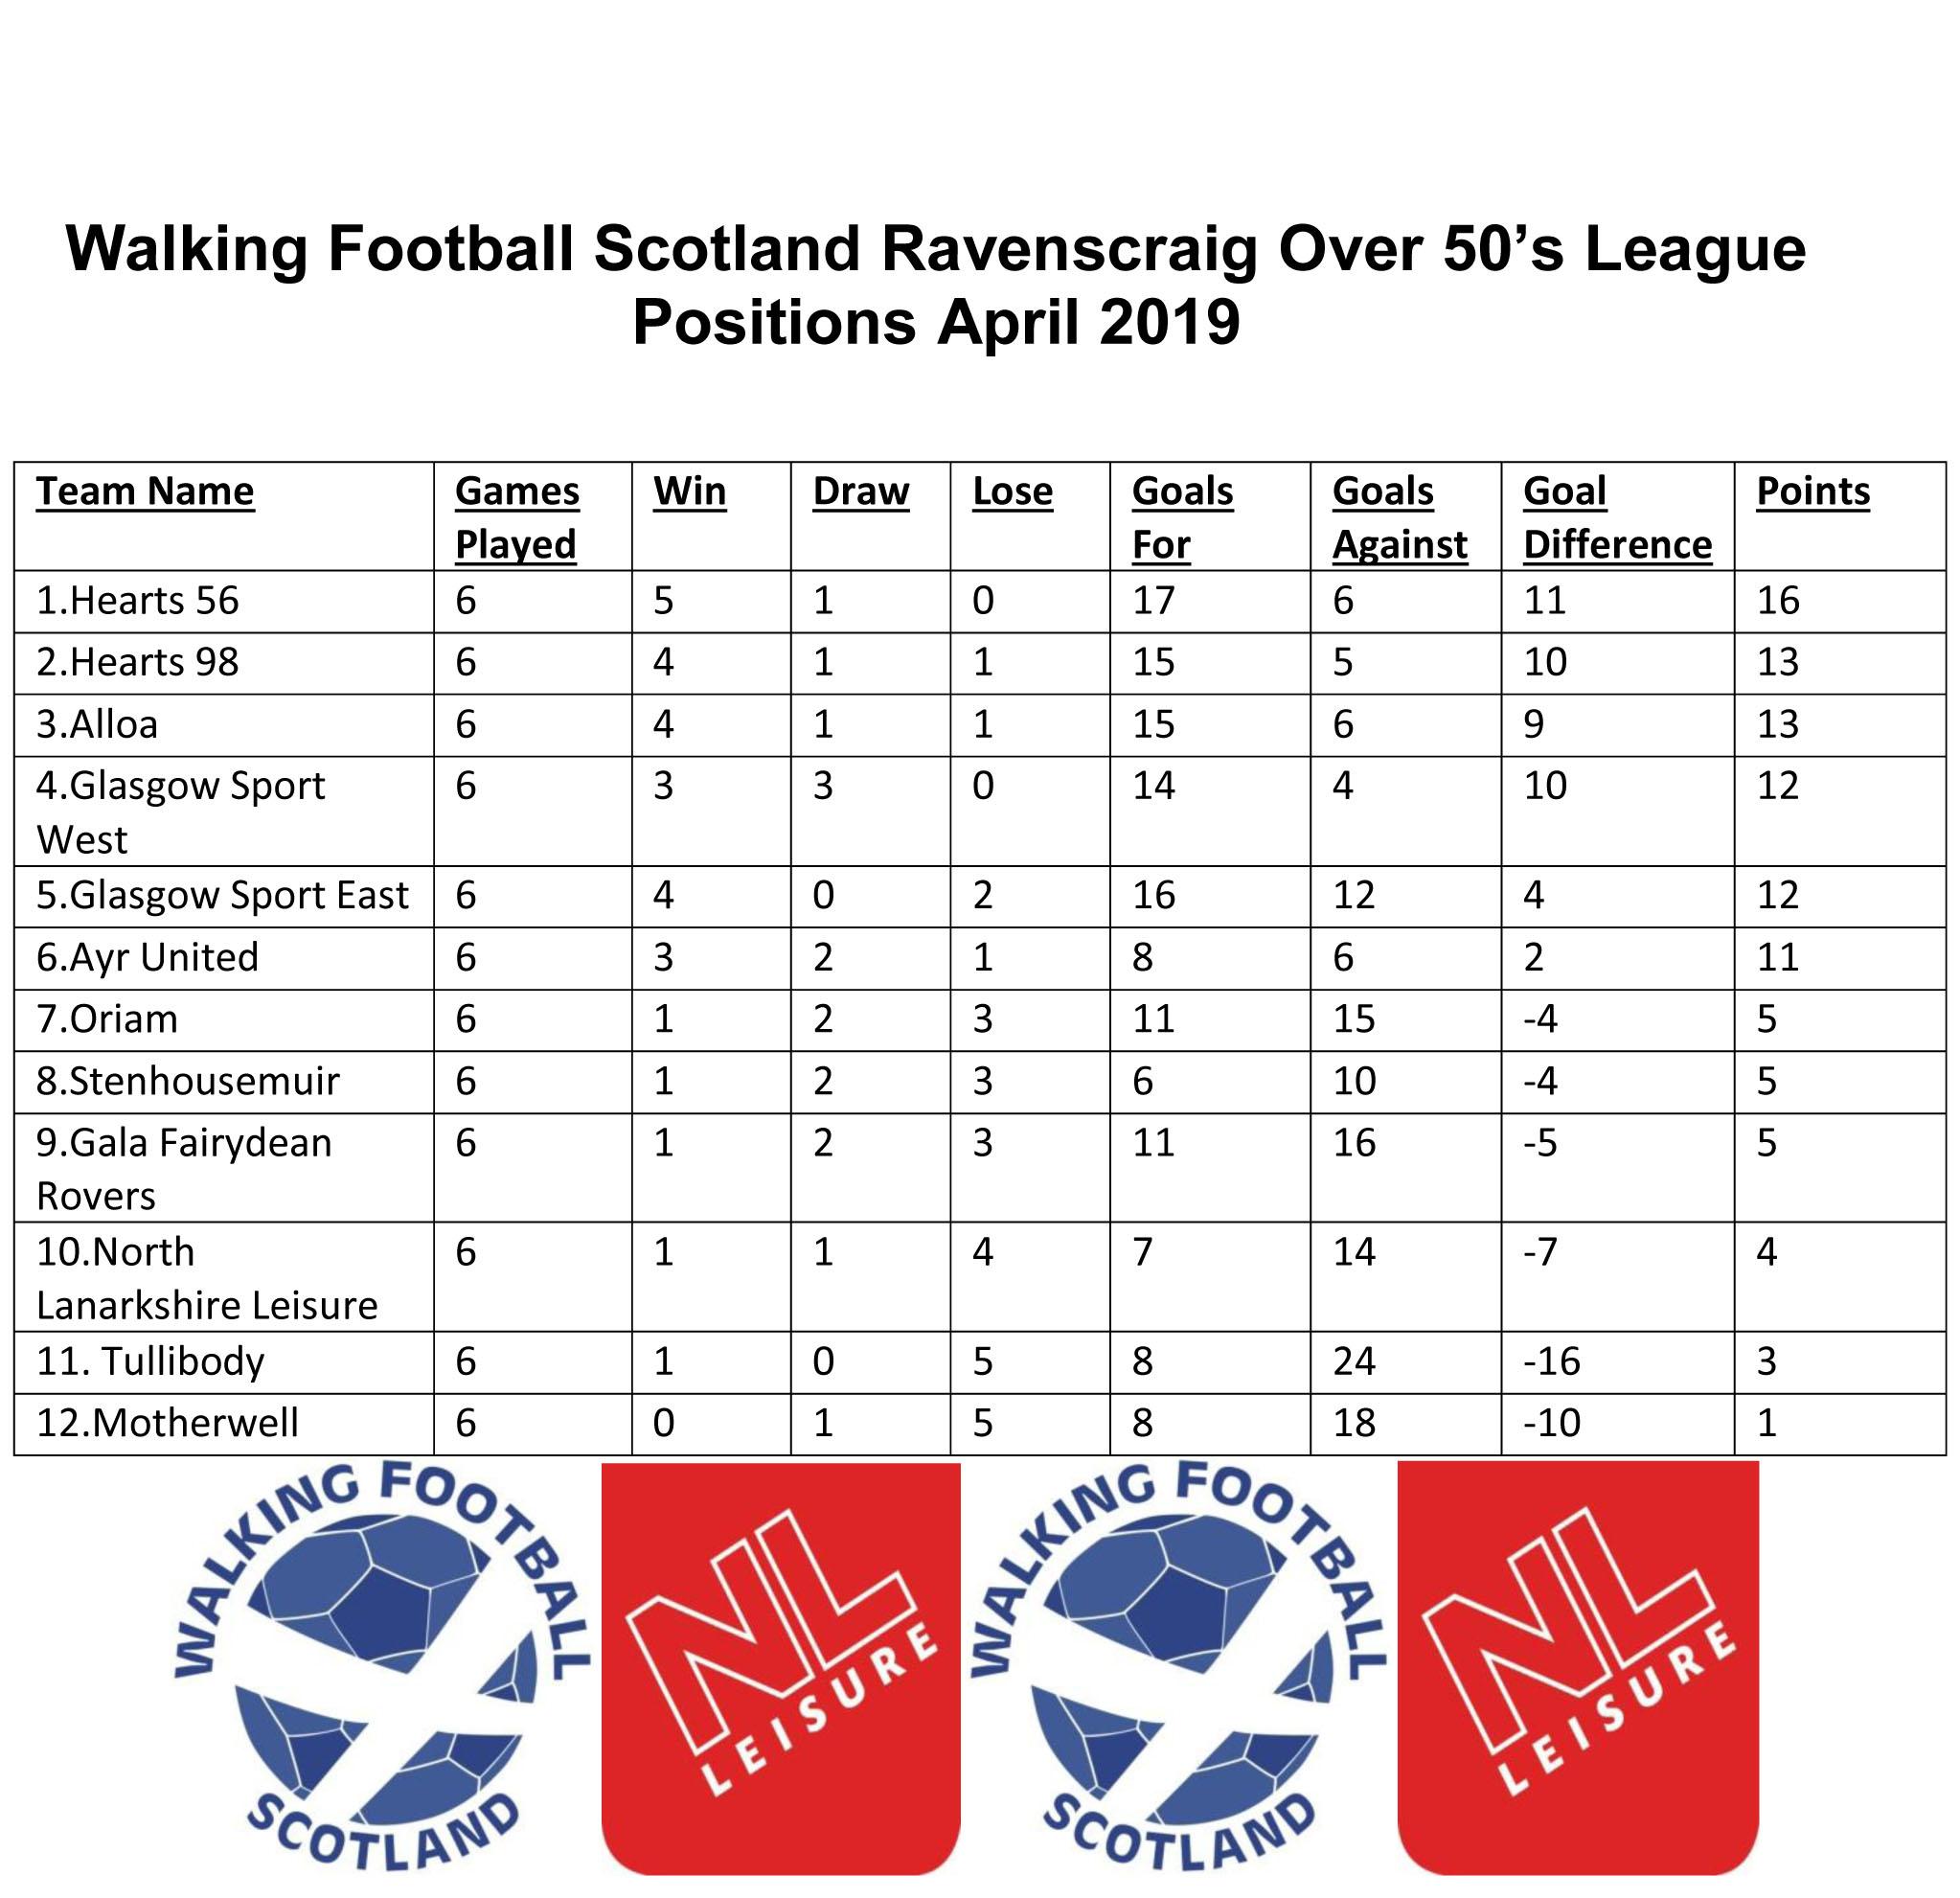 Walking Football Scotland Ravenscraig Over 50 League Positions April.jpg